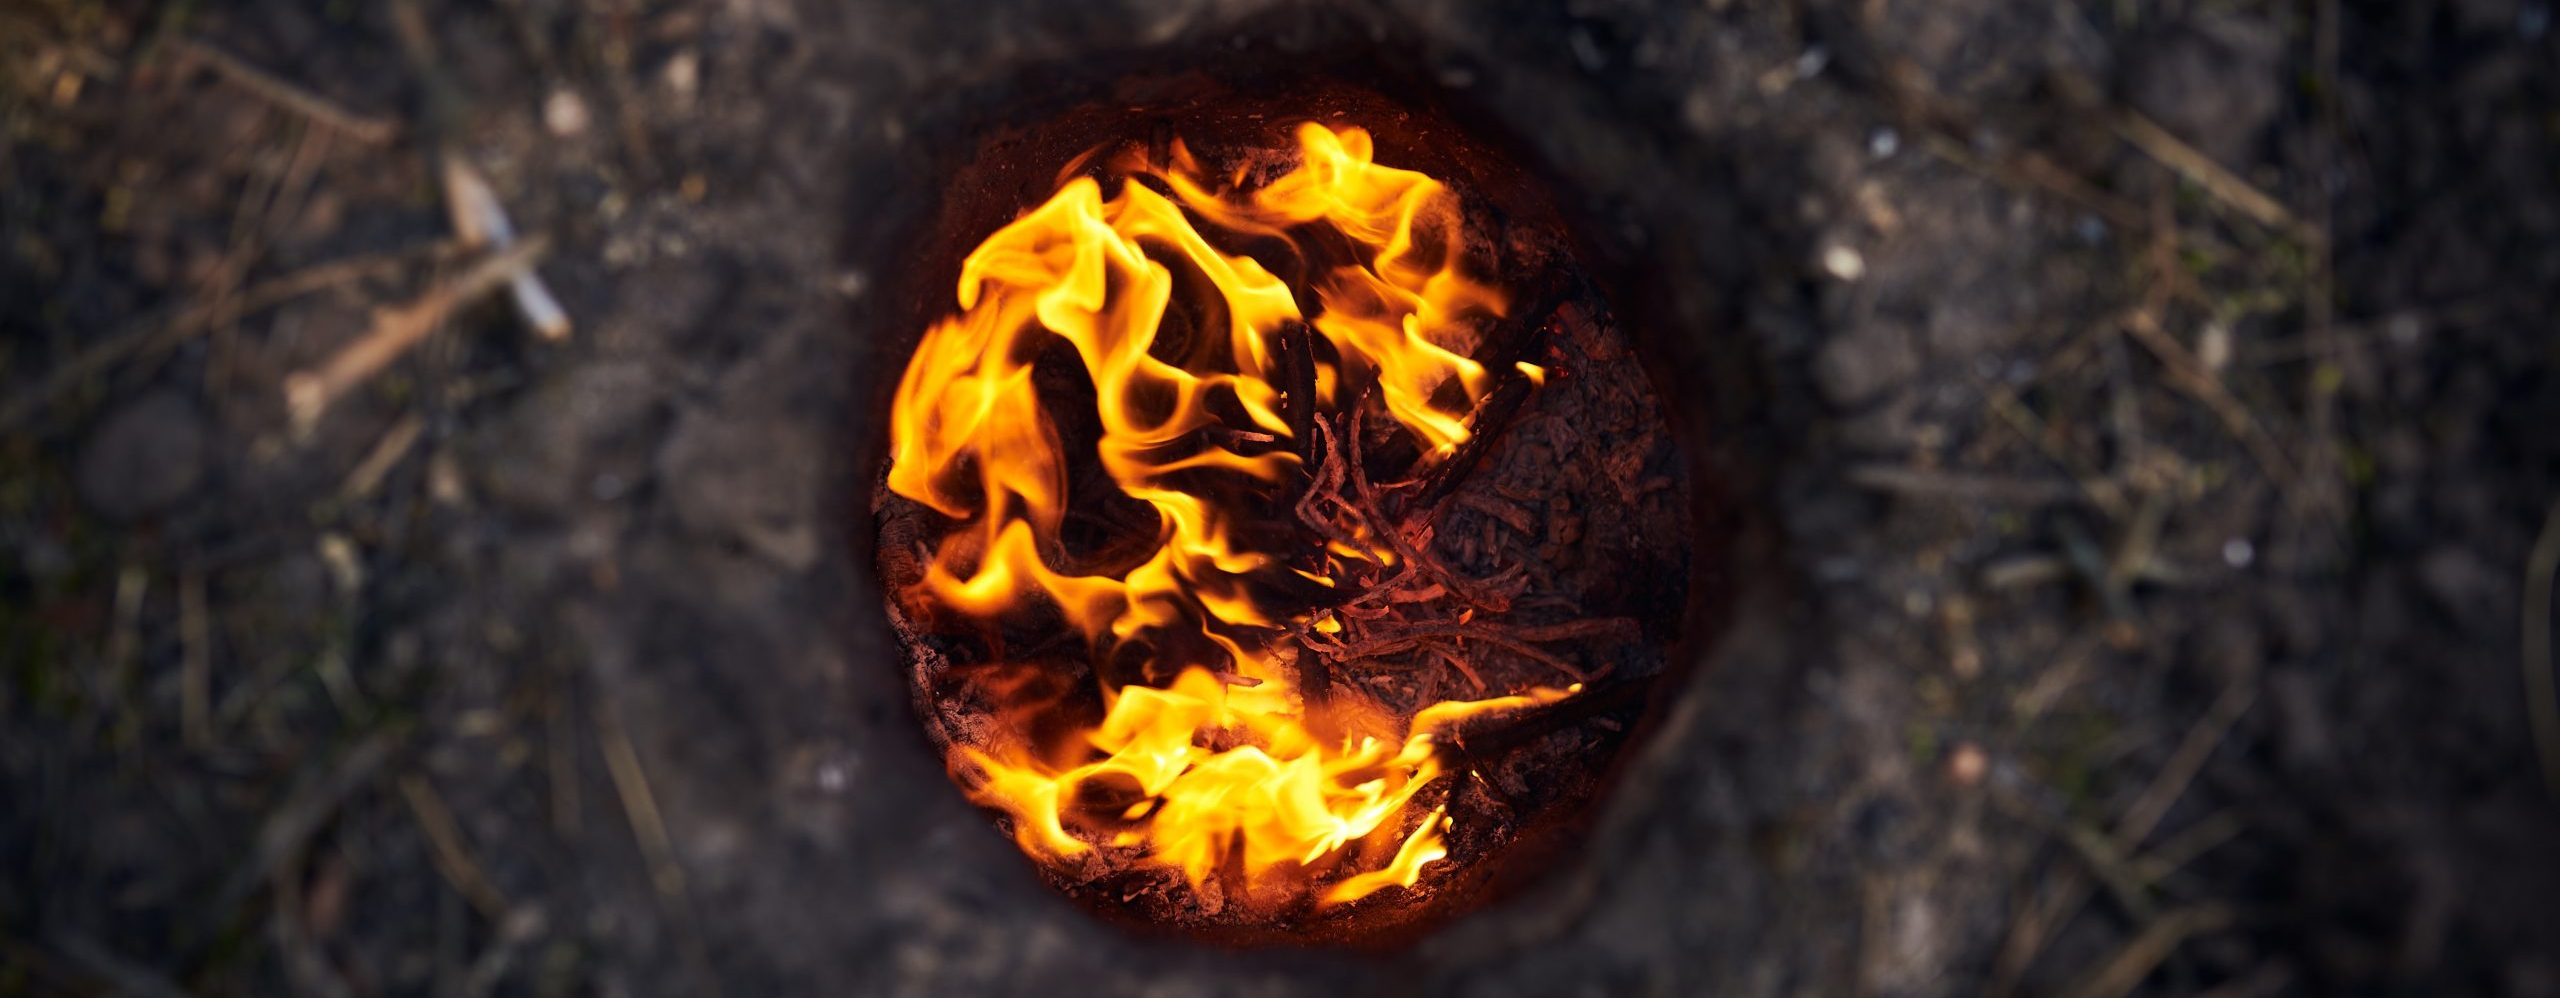 The Dakota Fire Pit Origins